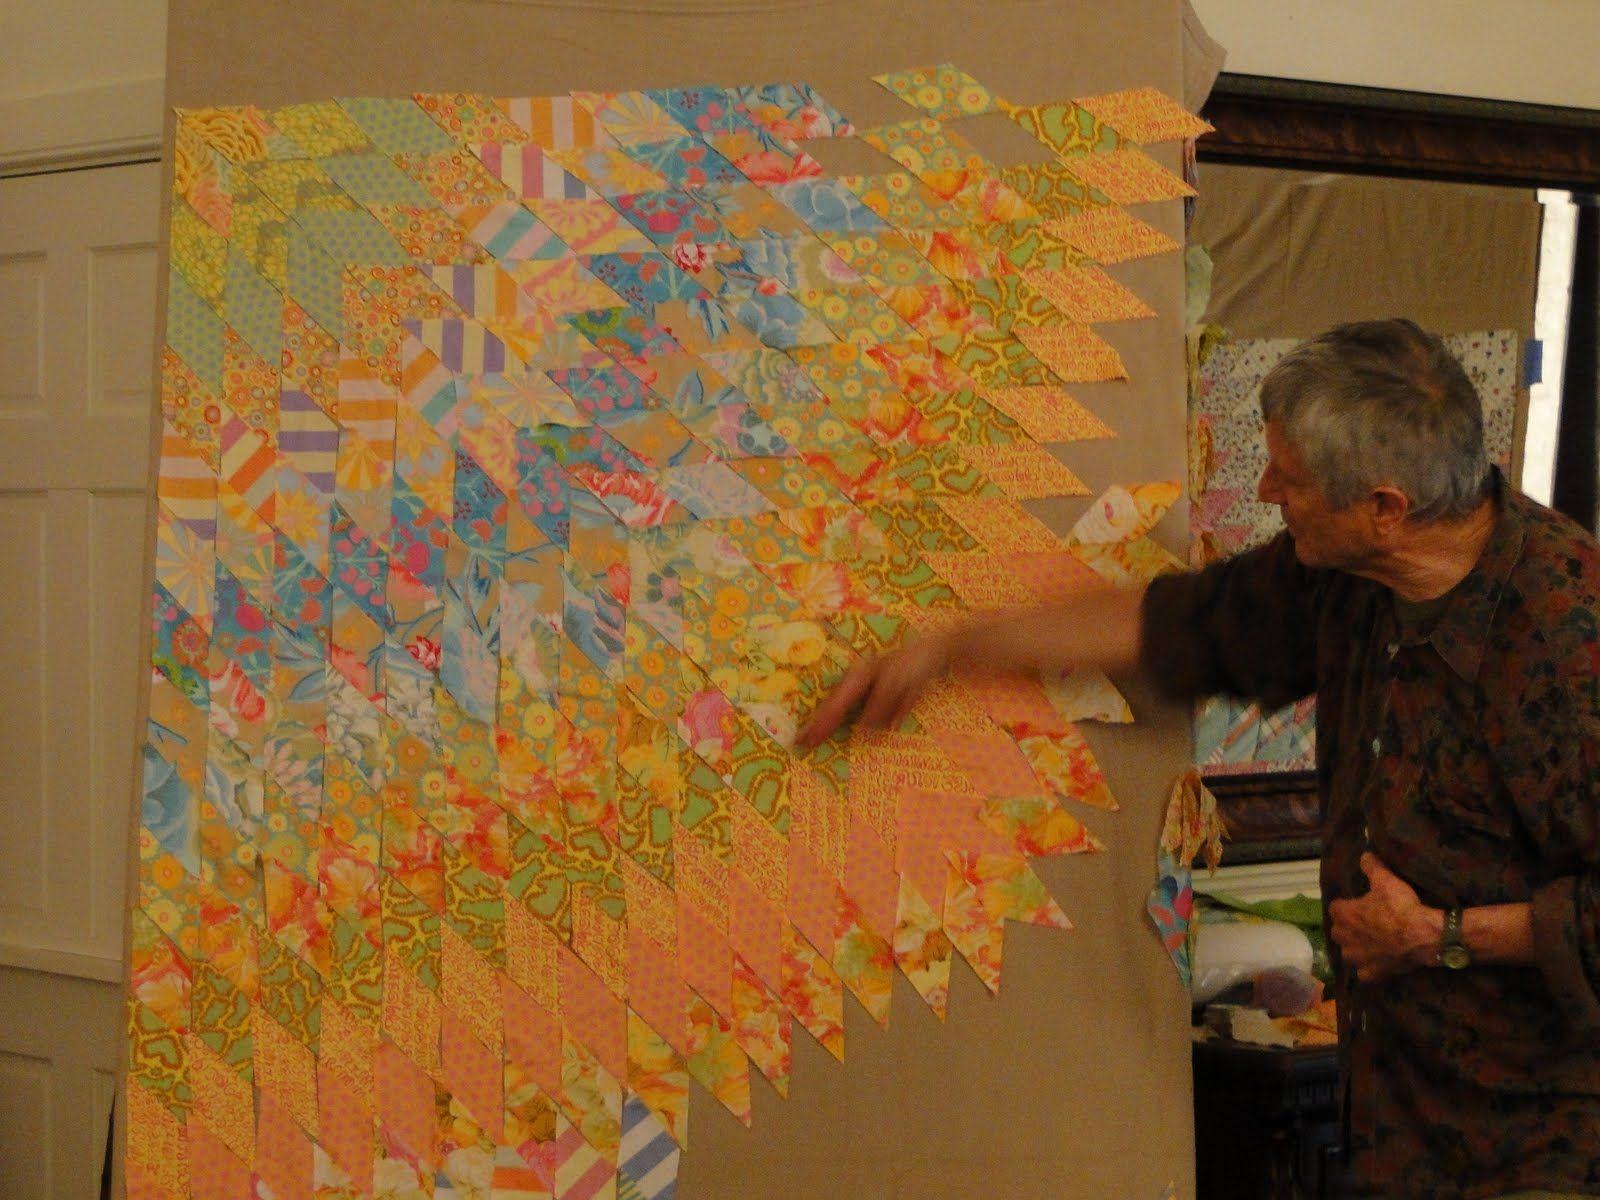 Big Rig Quilting - Kaffe Fasset class - looking at John Kubiniec's quilt.